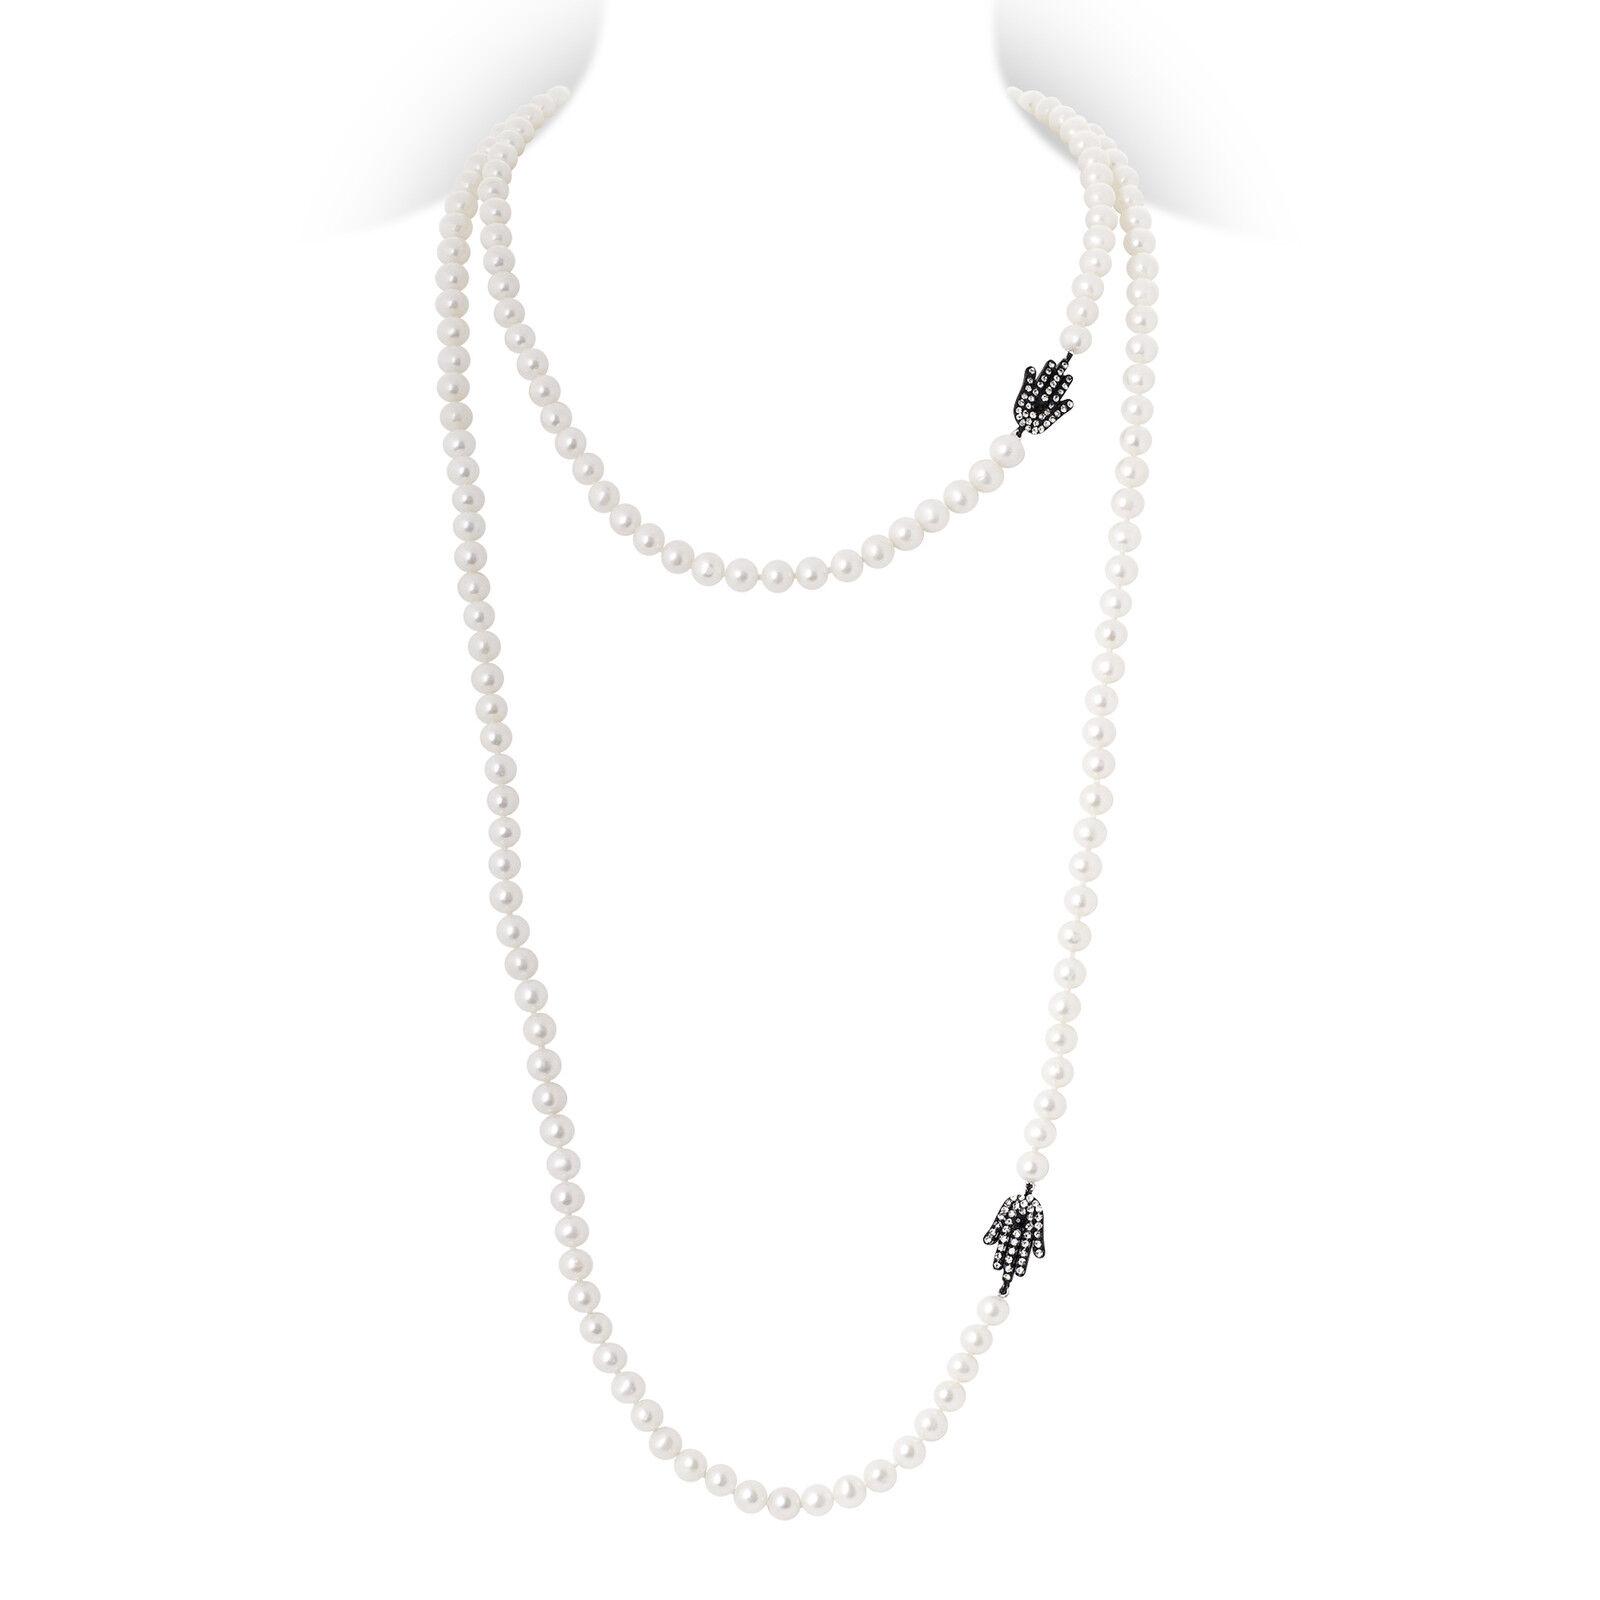 LUXUS Süsswasser Perlenkette HAMSA Anhänger black Zirkonias 130cm (LPK6)